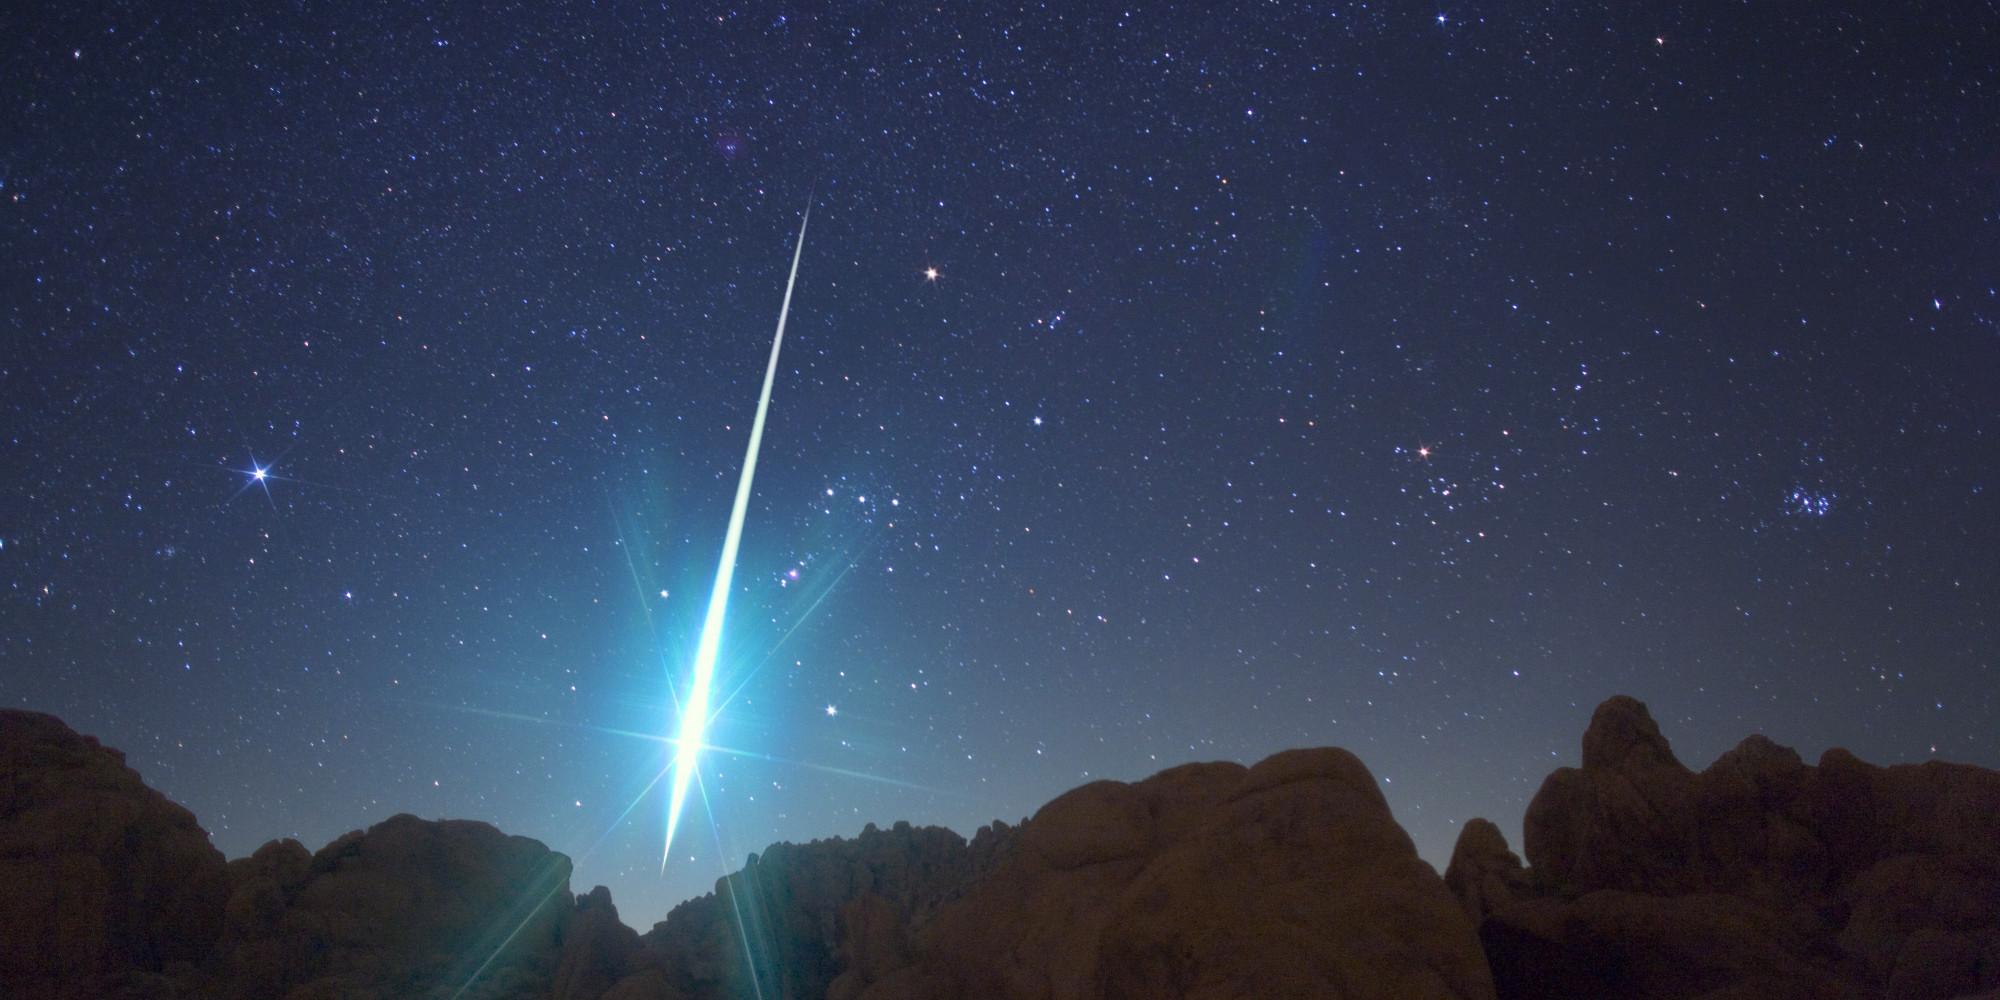 o-geminid-meteor-shower-facebook.jpg